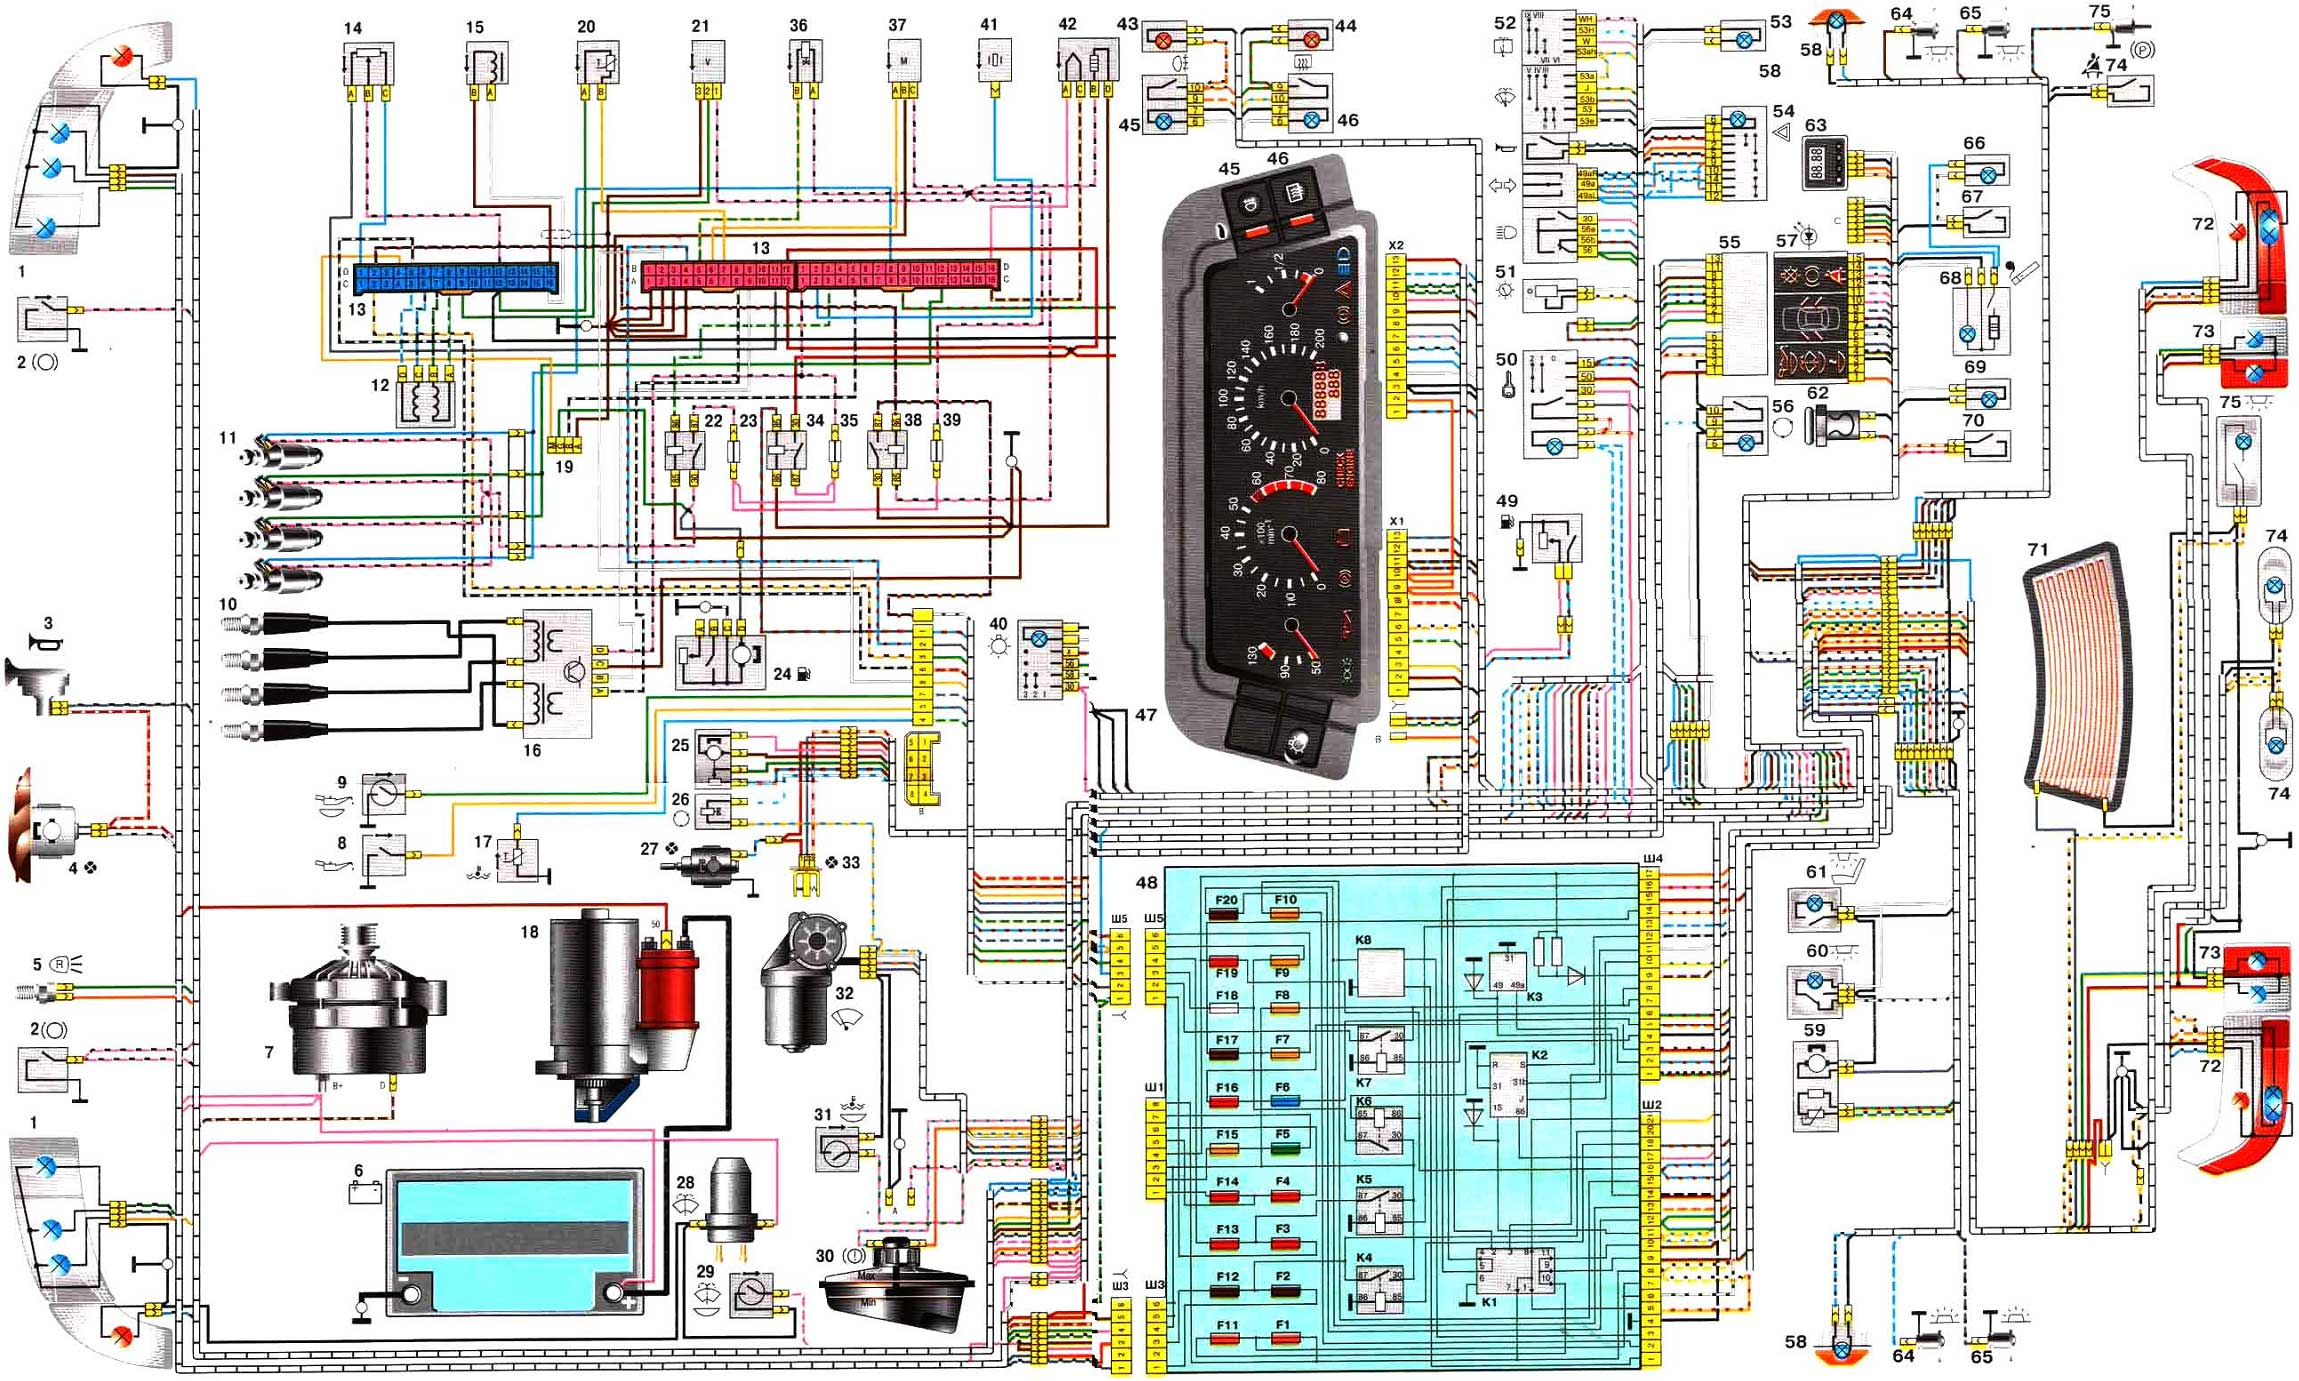 Фото №17 - ВАЗ 2110 инжектор схема